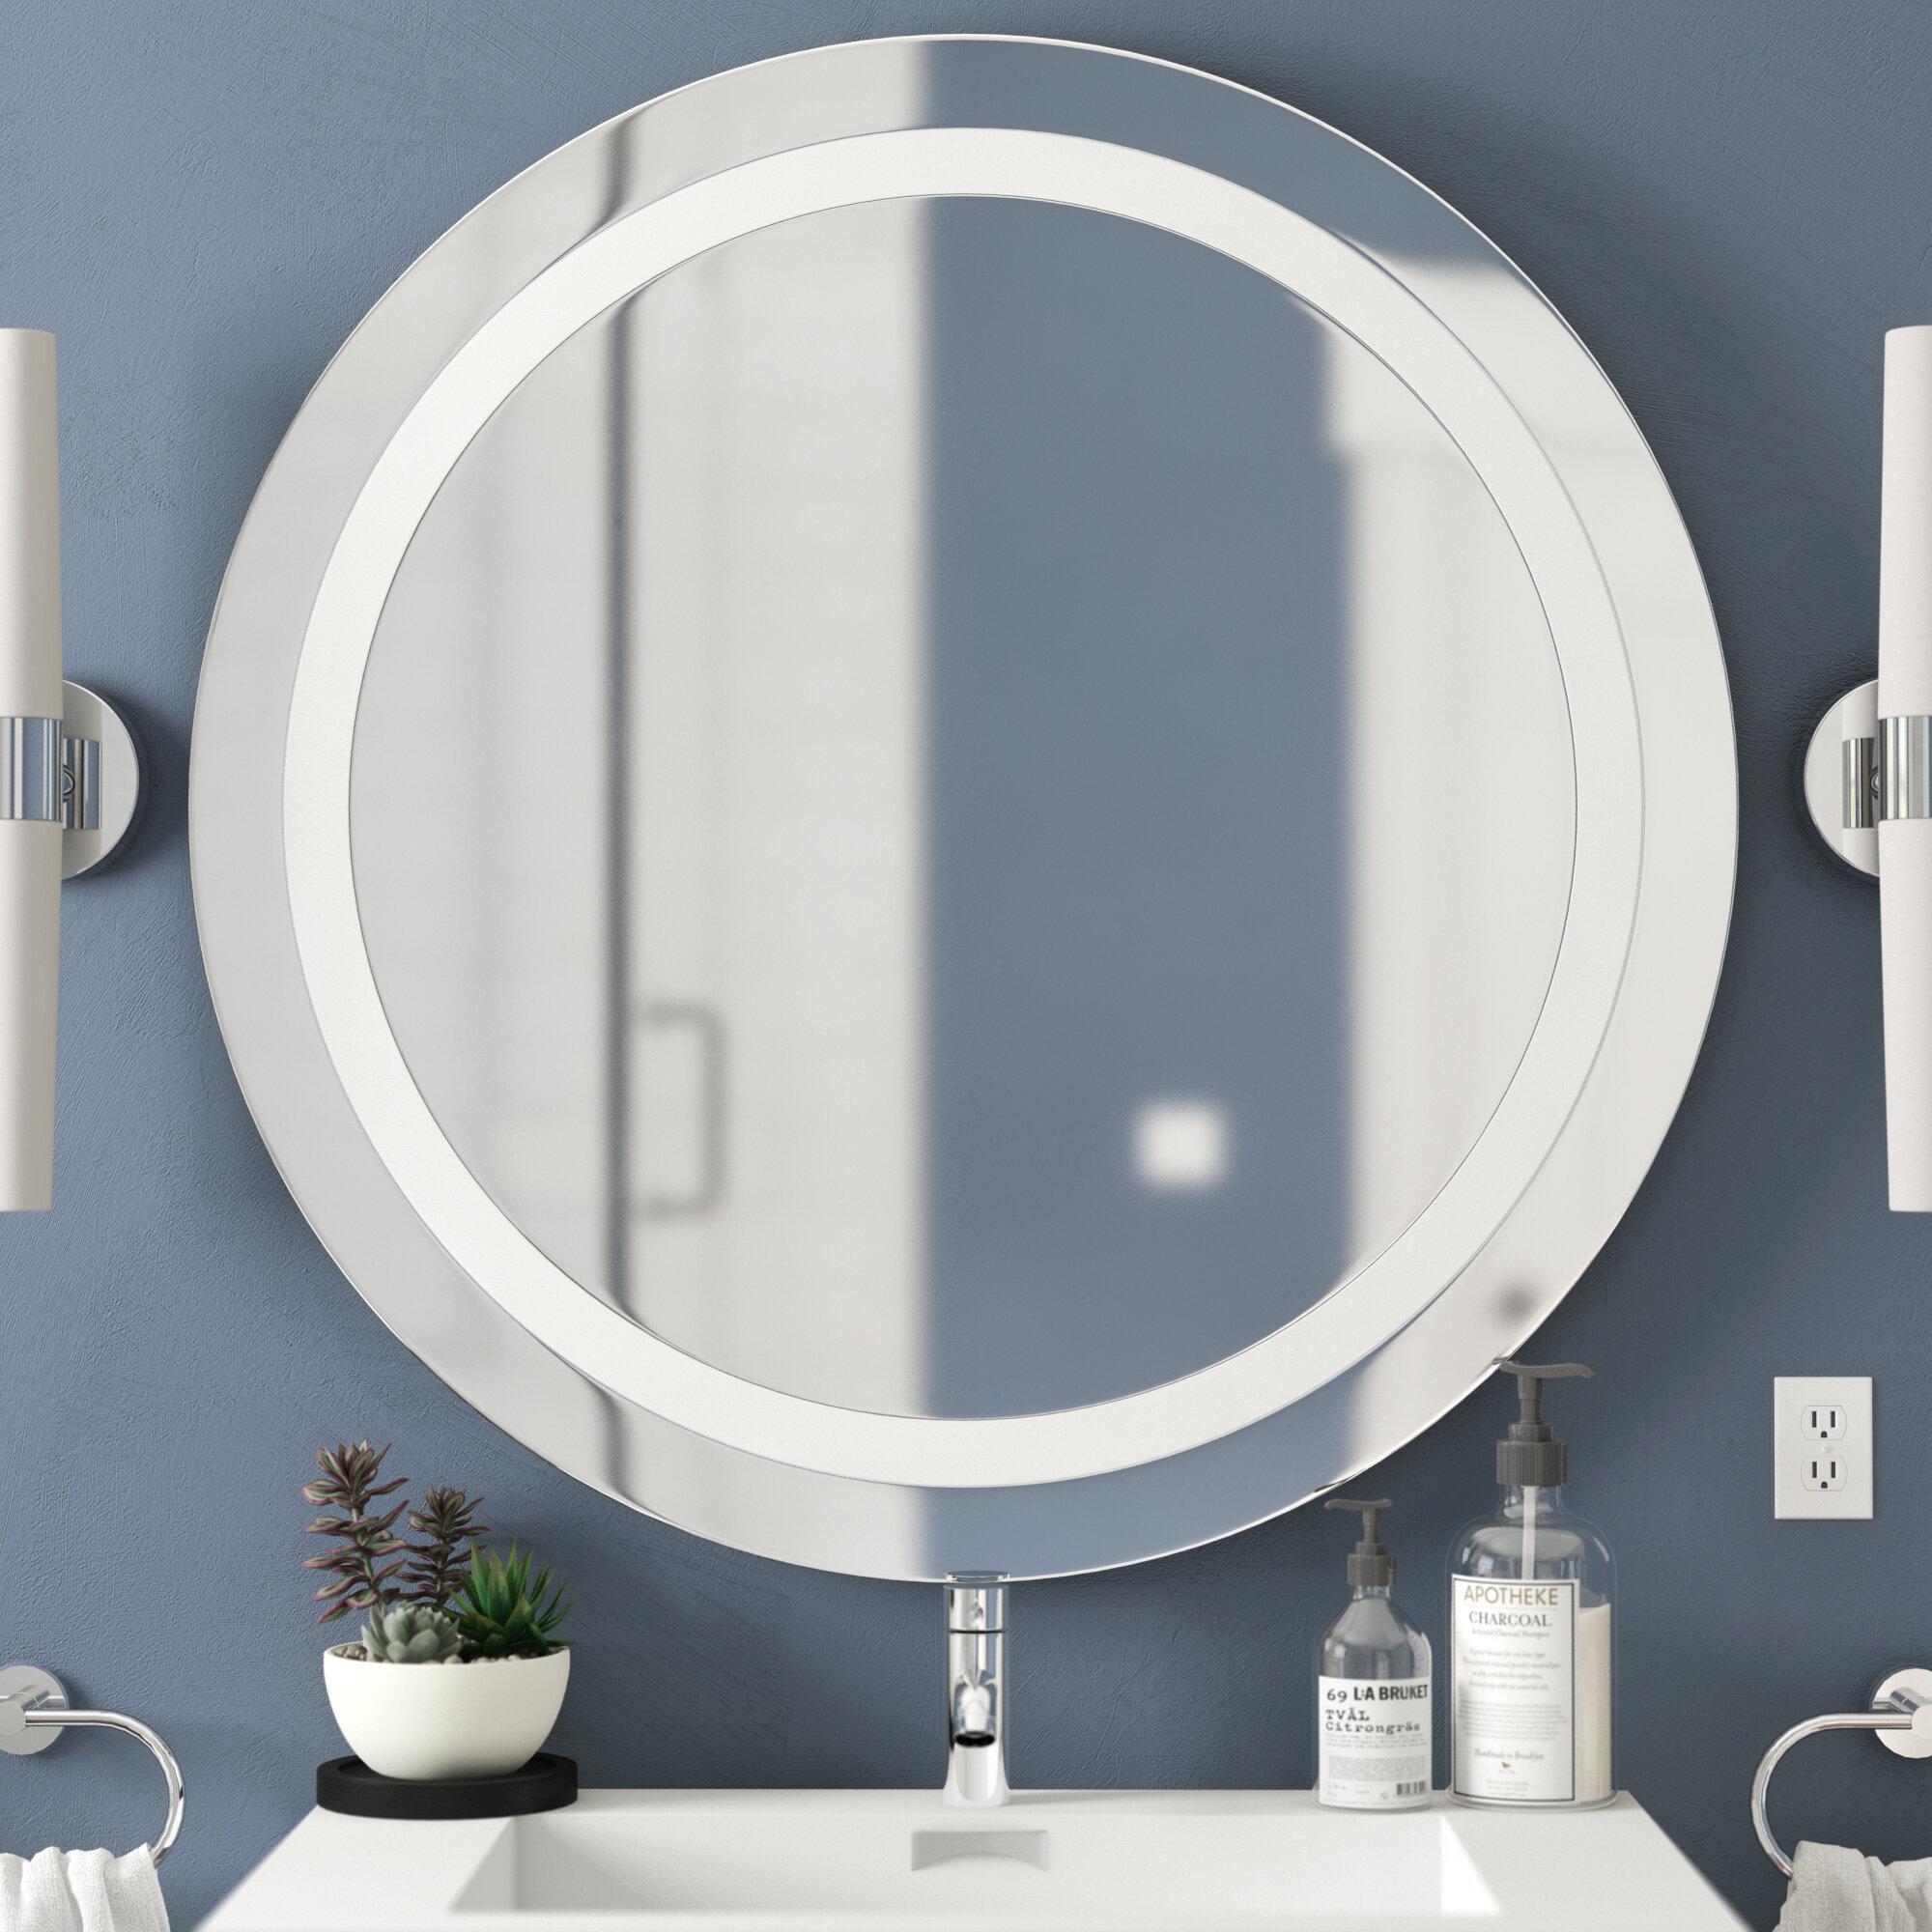 Ehrhart Illuminated Bathroom/Vanity Mirror